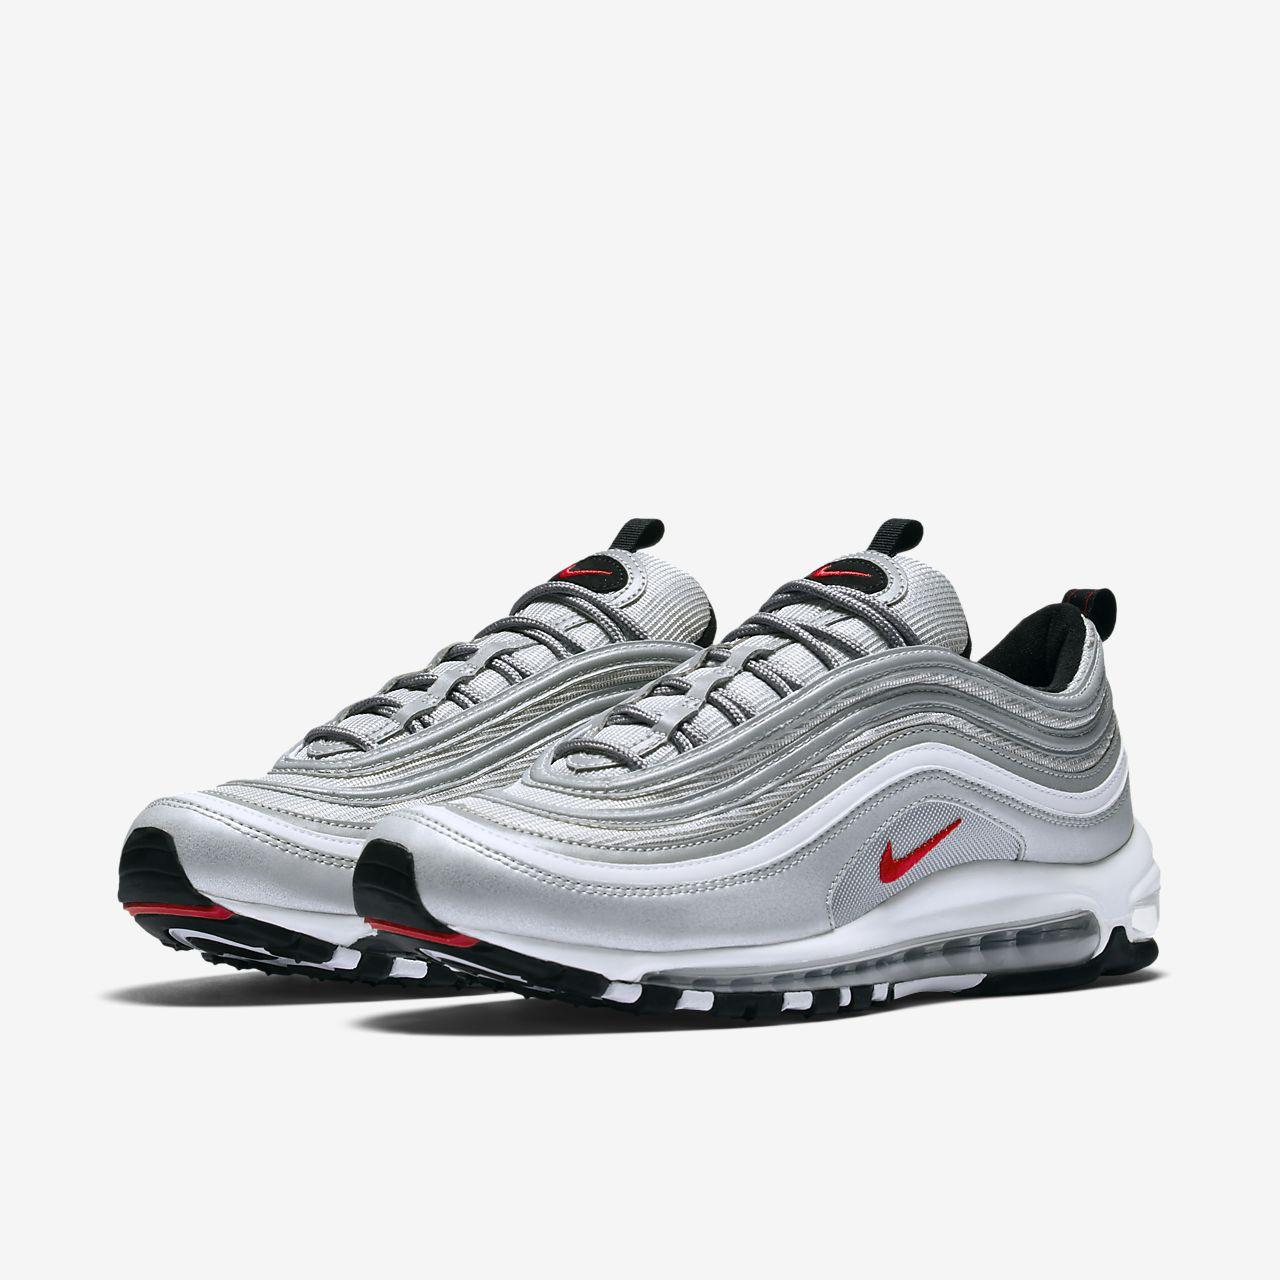 scarpe air max 97 nere